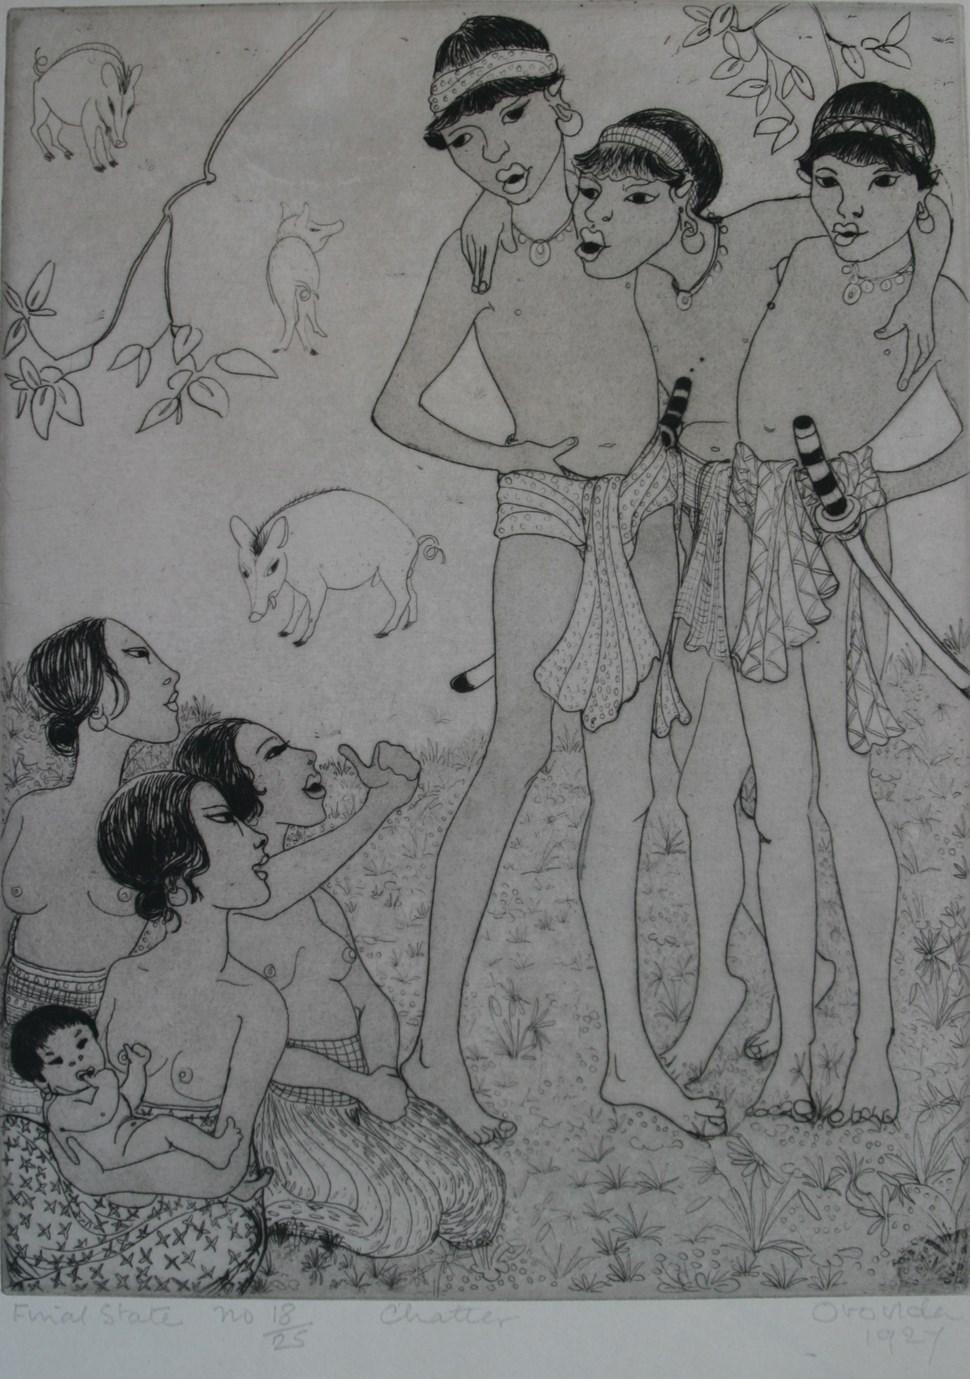 Chatter - Orovida Pissarro (1893 - 1968)